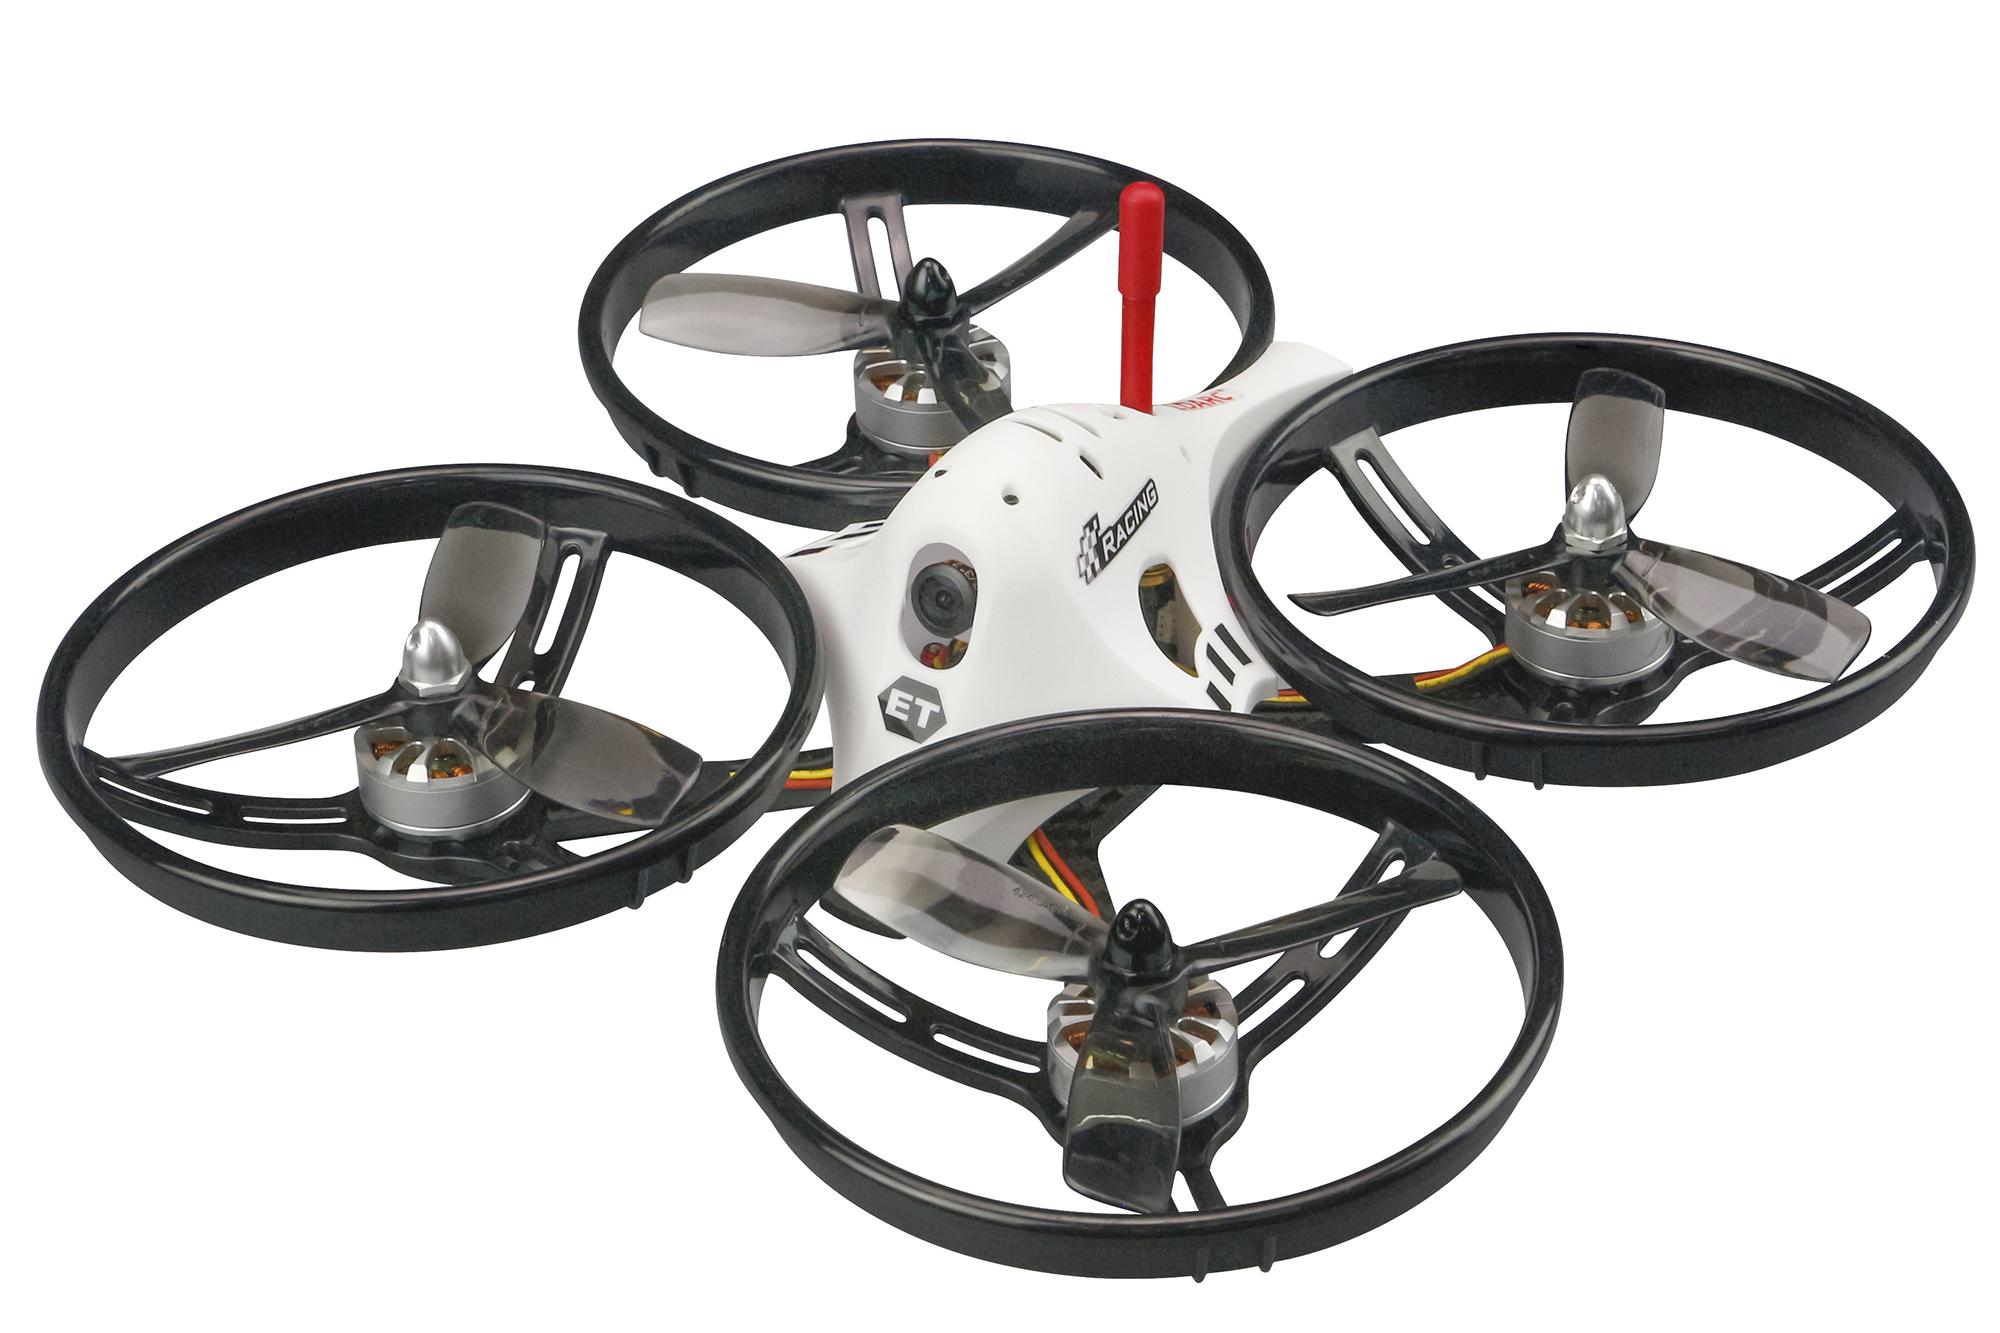 ET MAX FPV(LDARC/KING KONG)受信機搭載、飛行調整済み(送料無料)